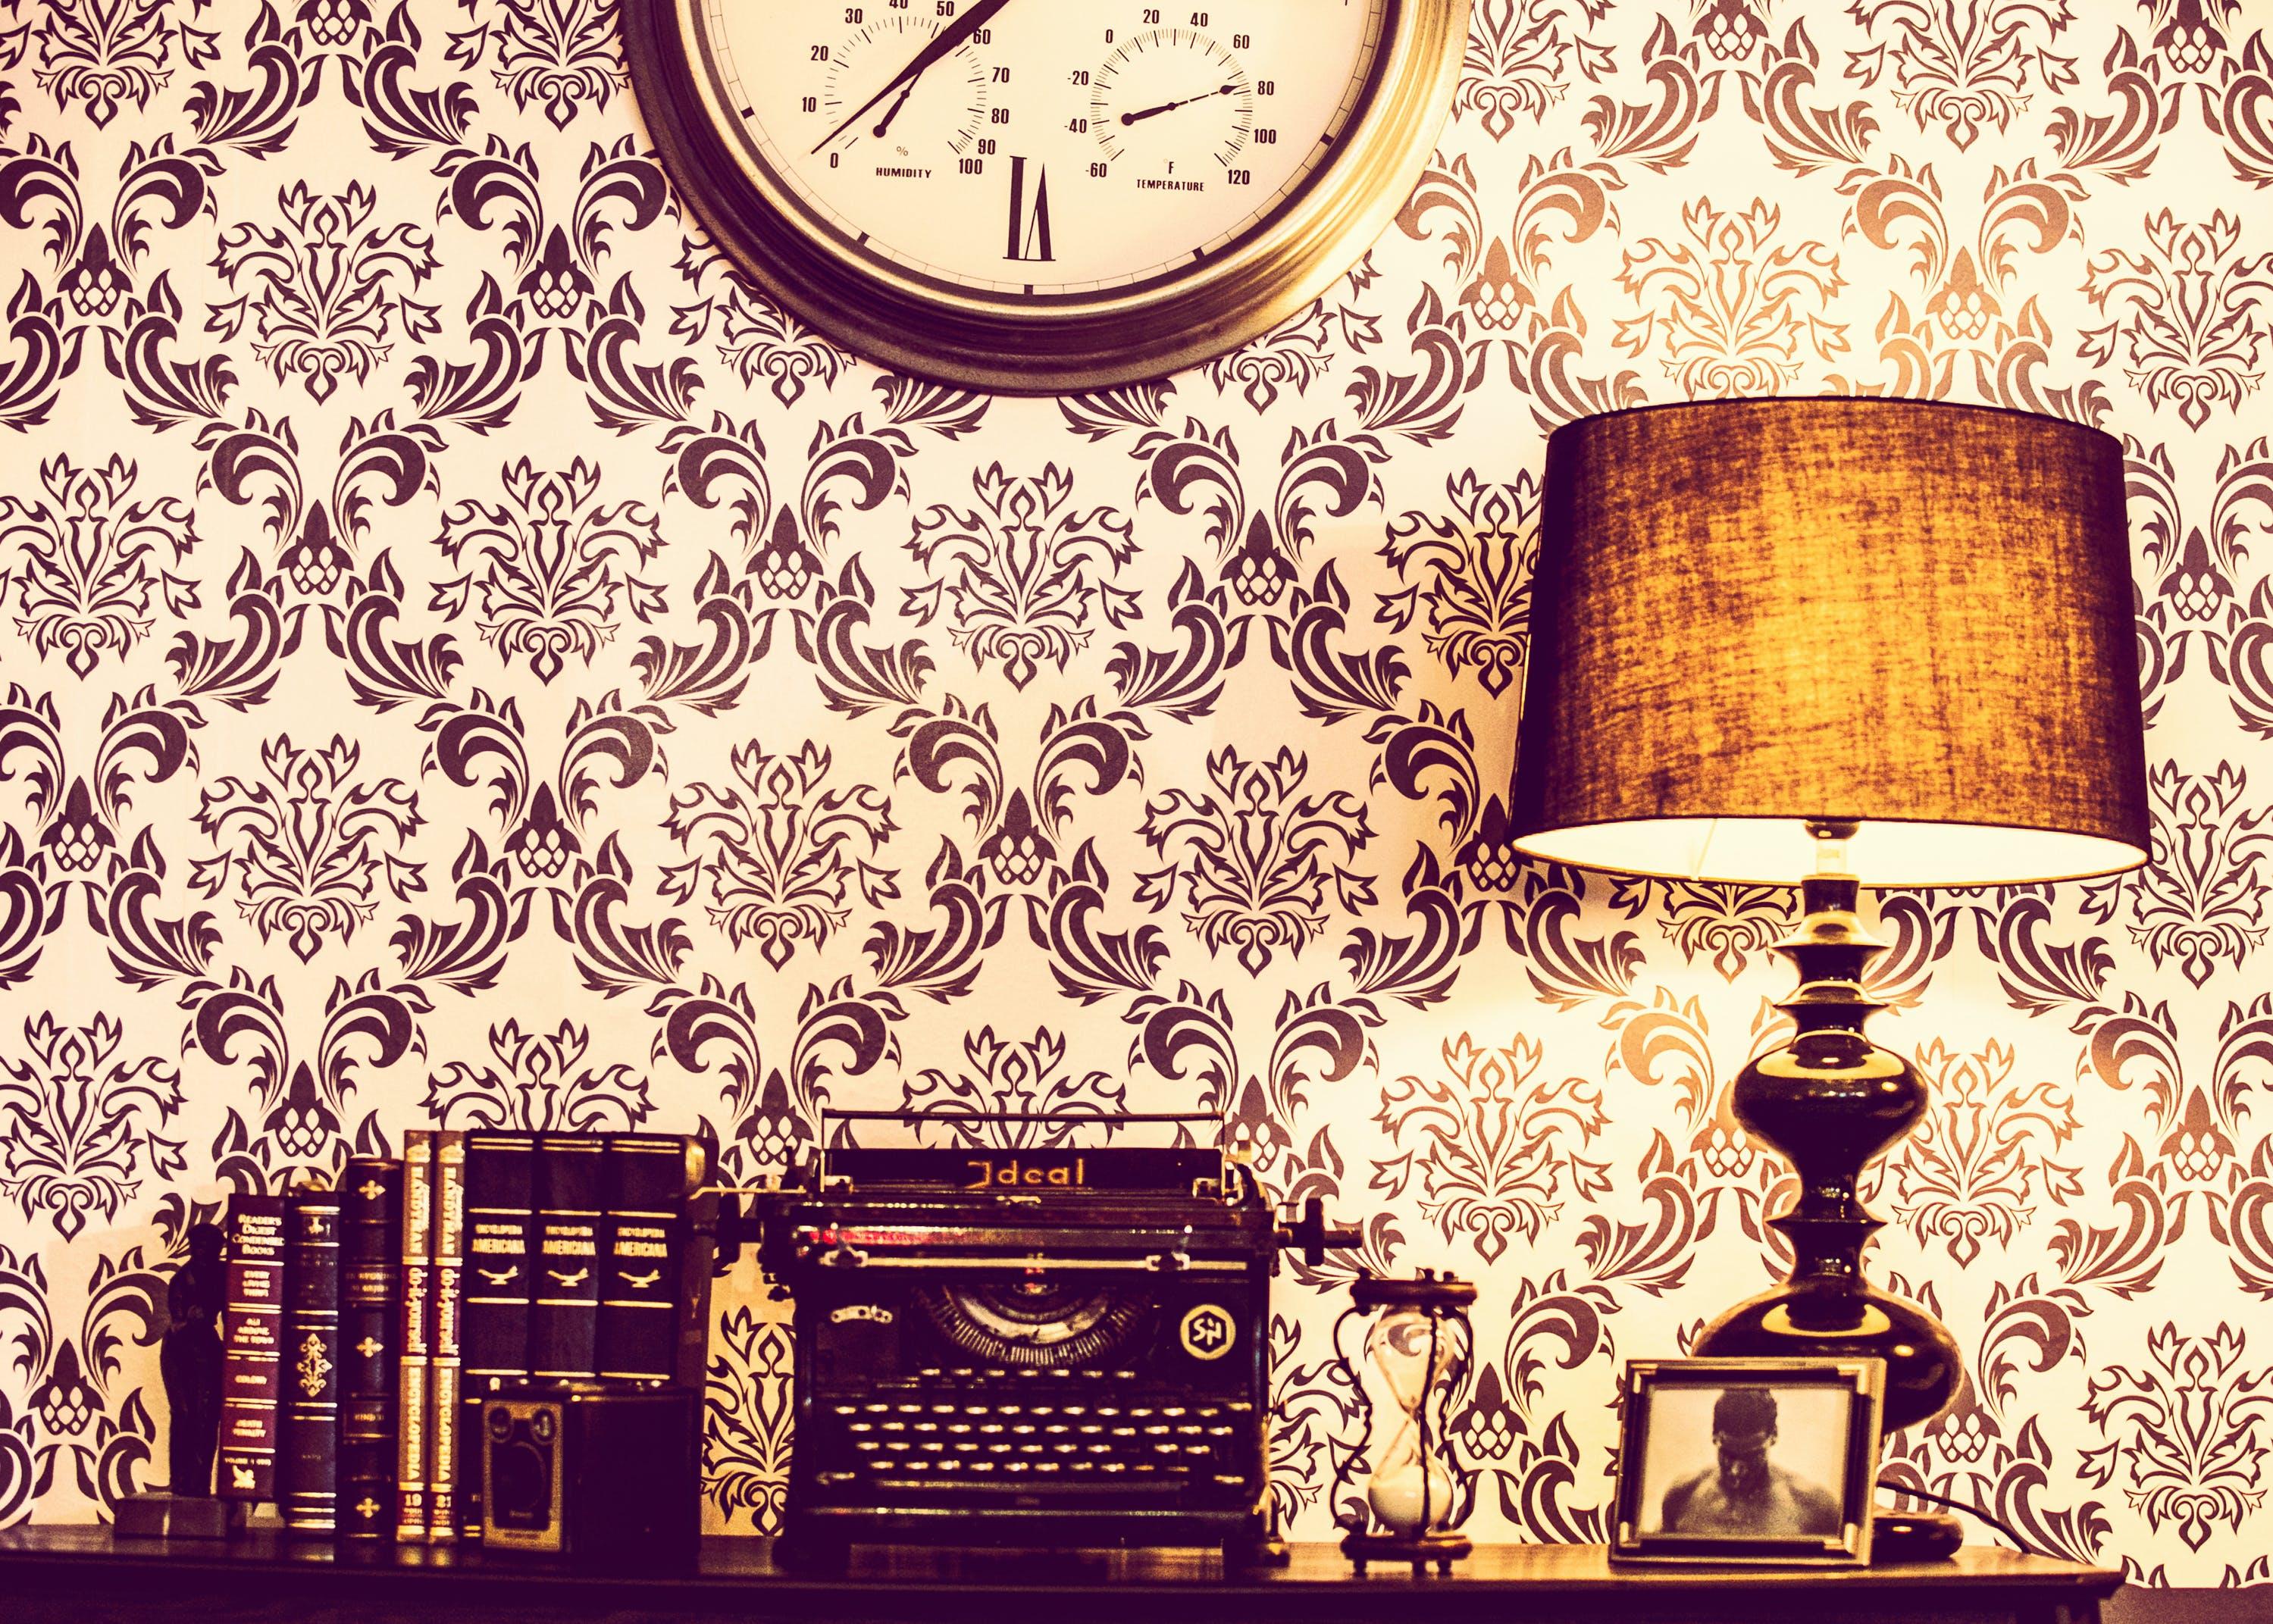 Brown Wooden Table Lamp Beside of Black Typwriter